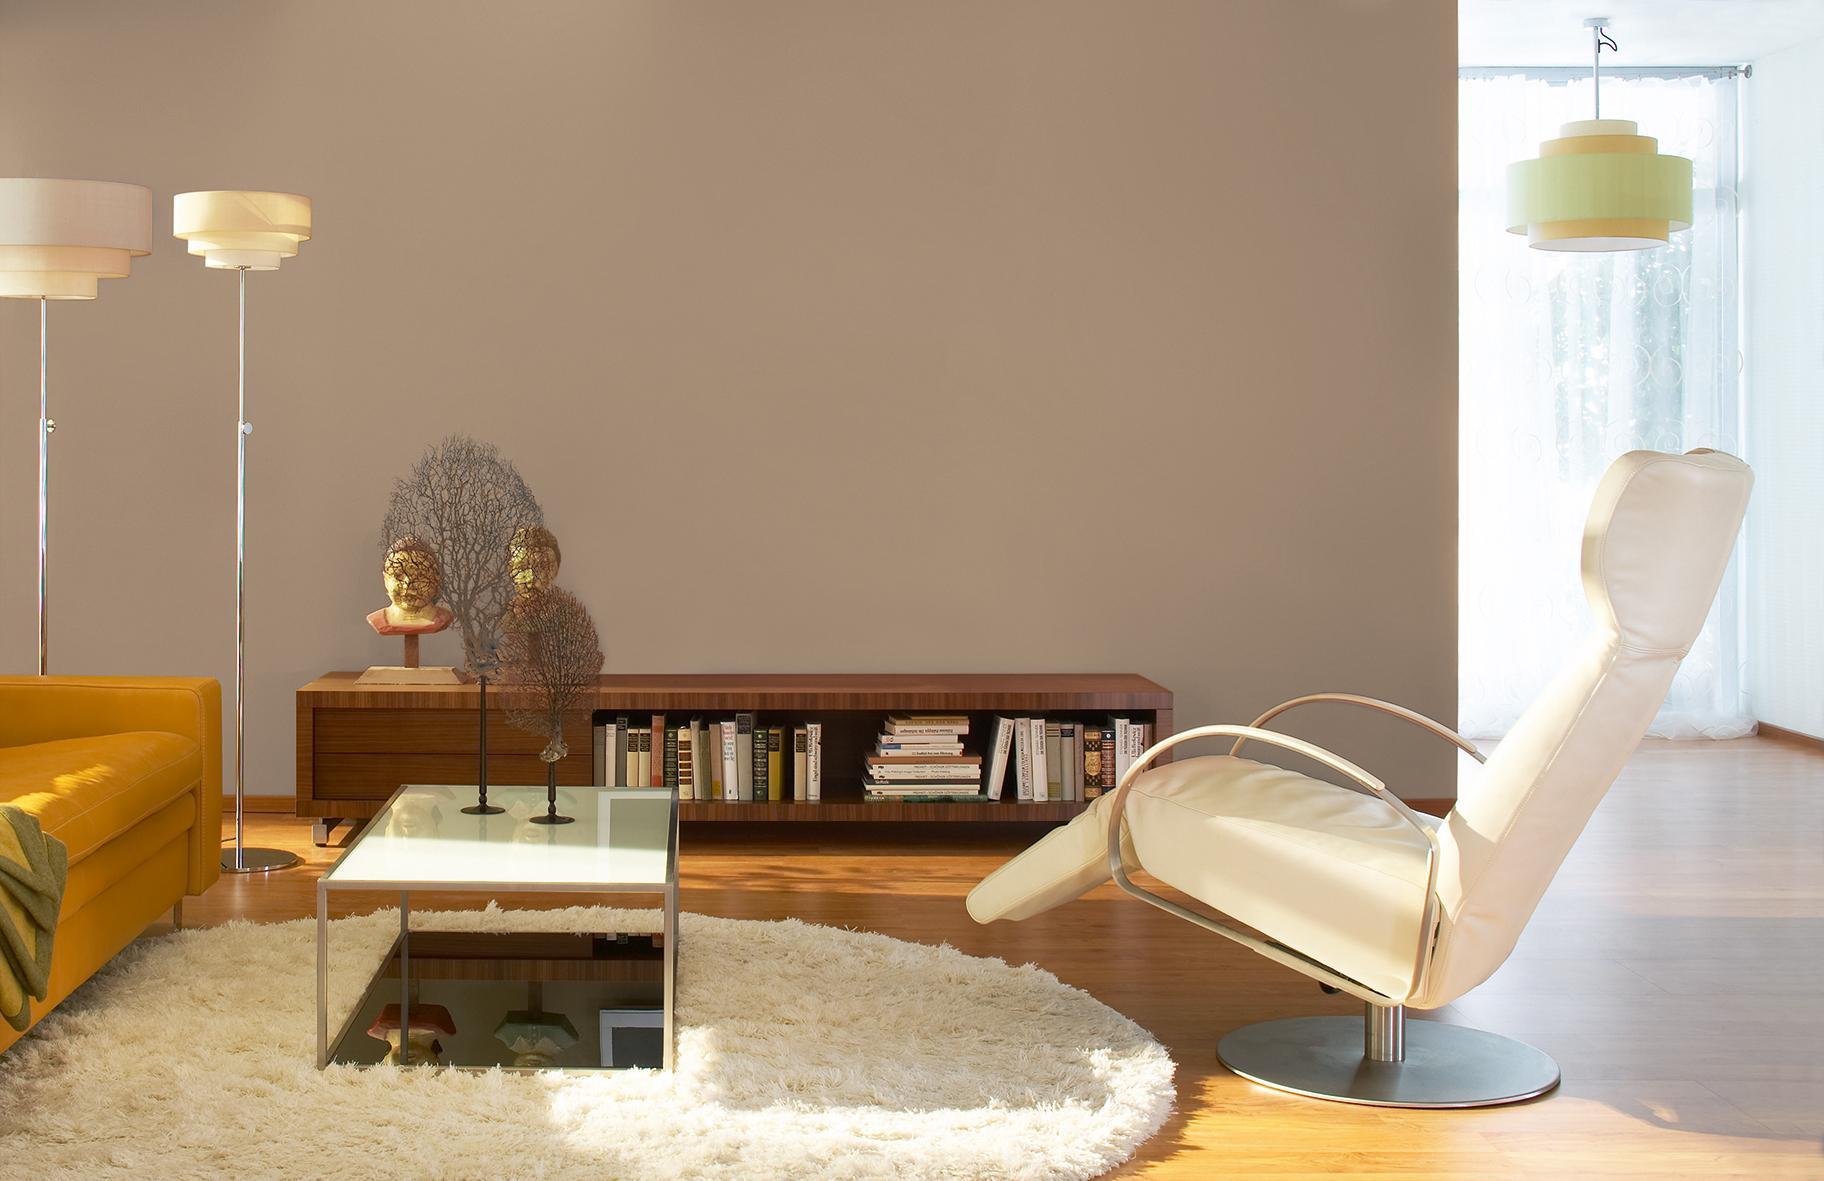 https://www.couchstyle.de/bilder/hauptbild/macchia...